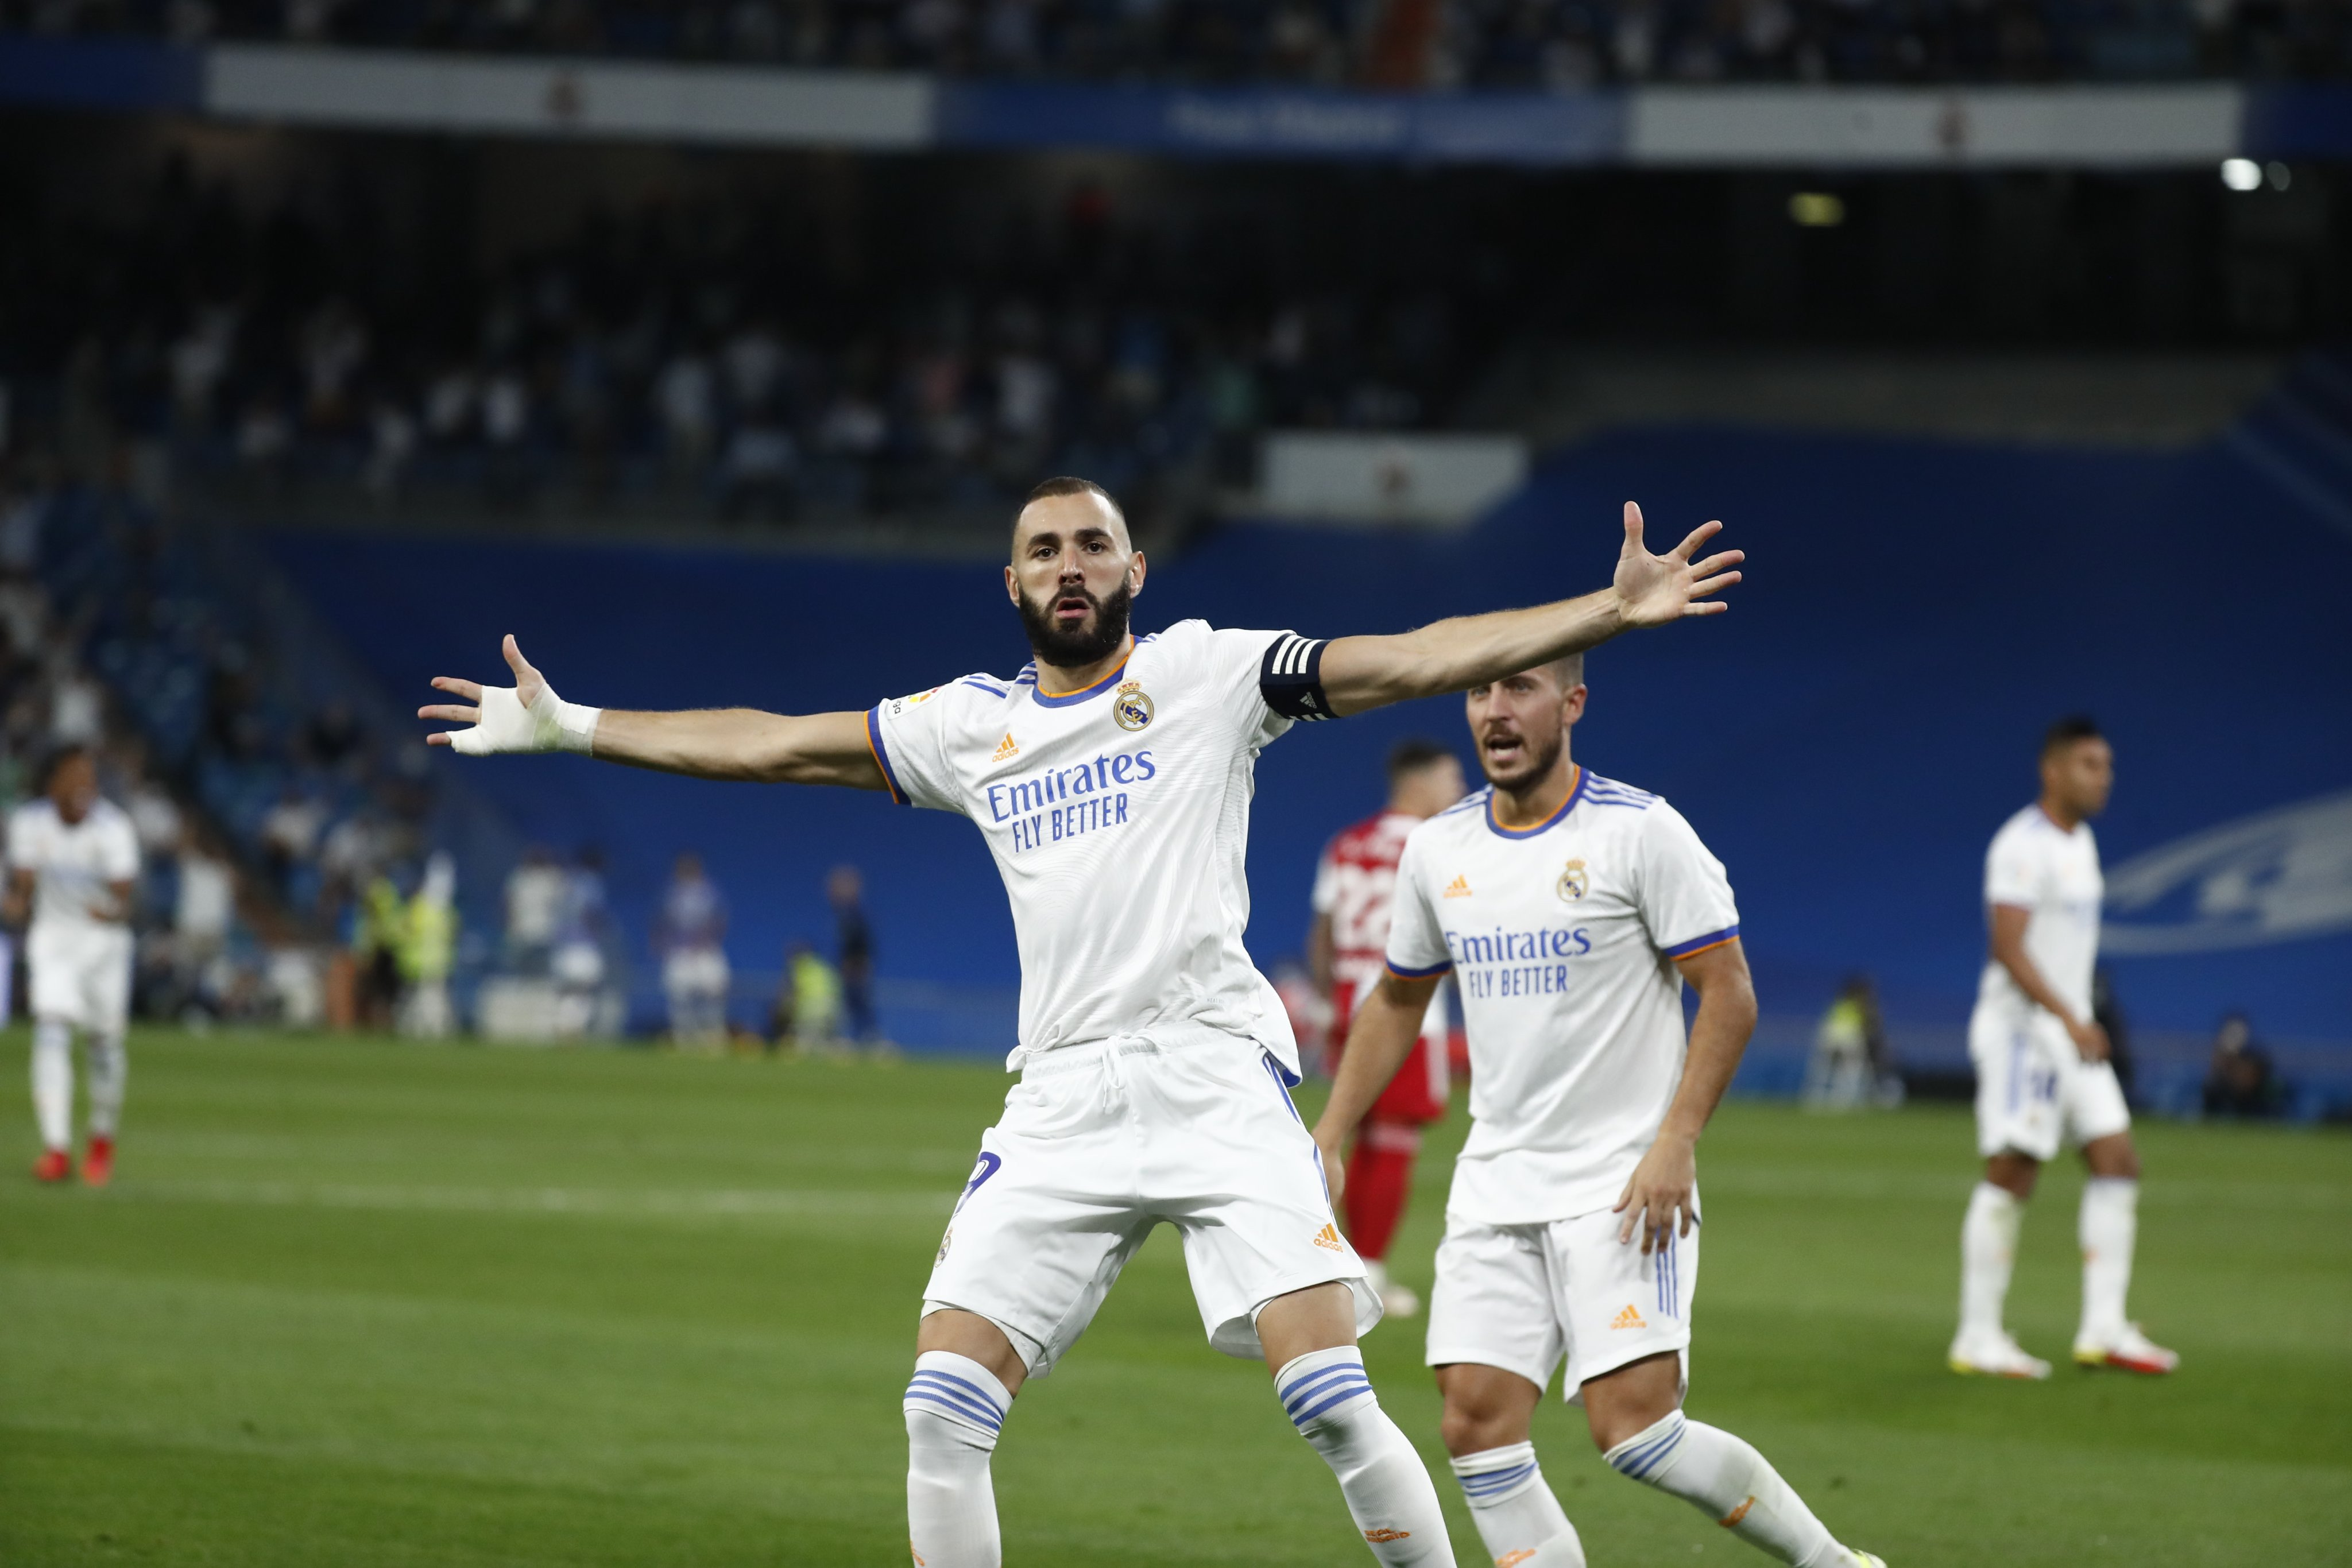 Madrid vs Sheriff: Prediksi dan Head to Head Kedua Klub - JPNN.com